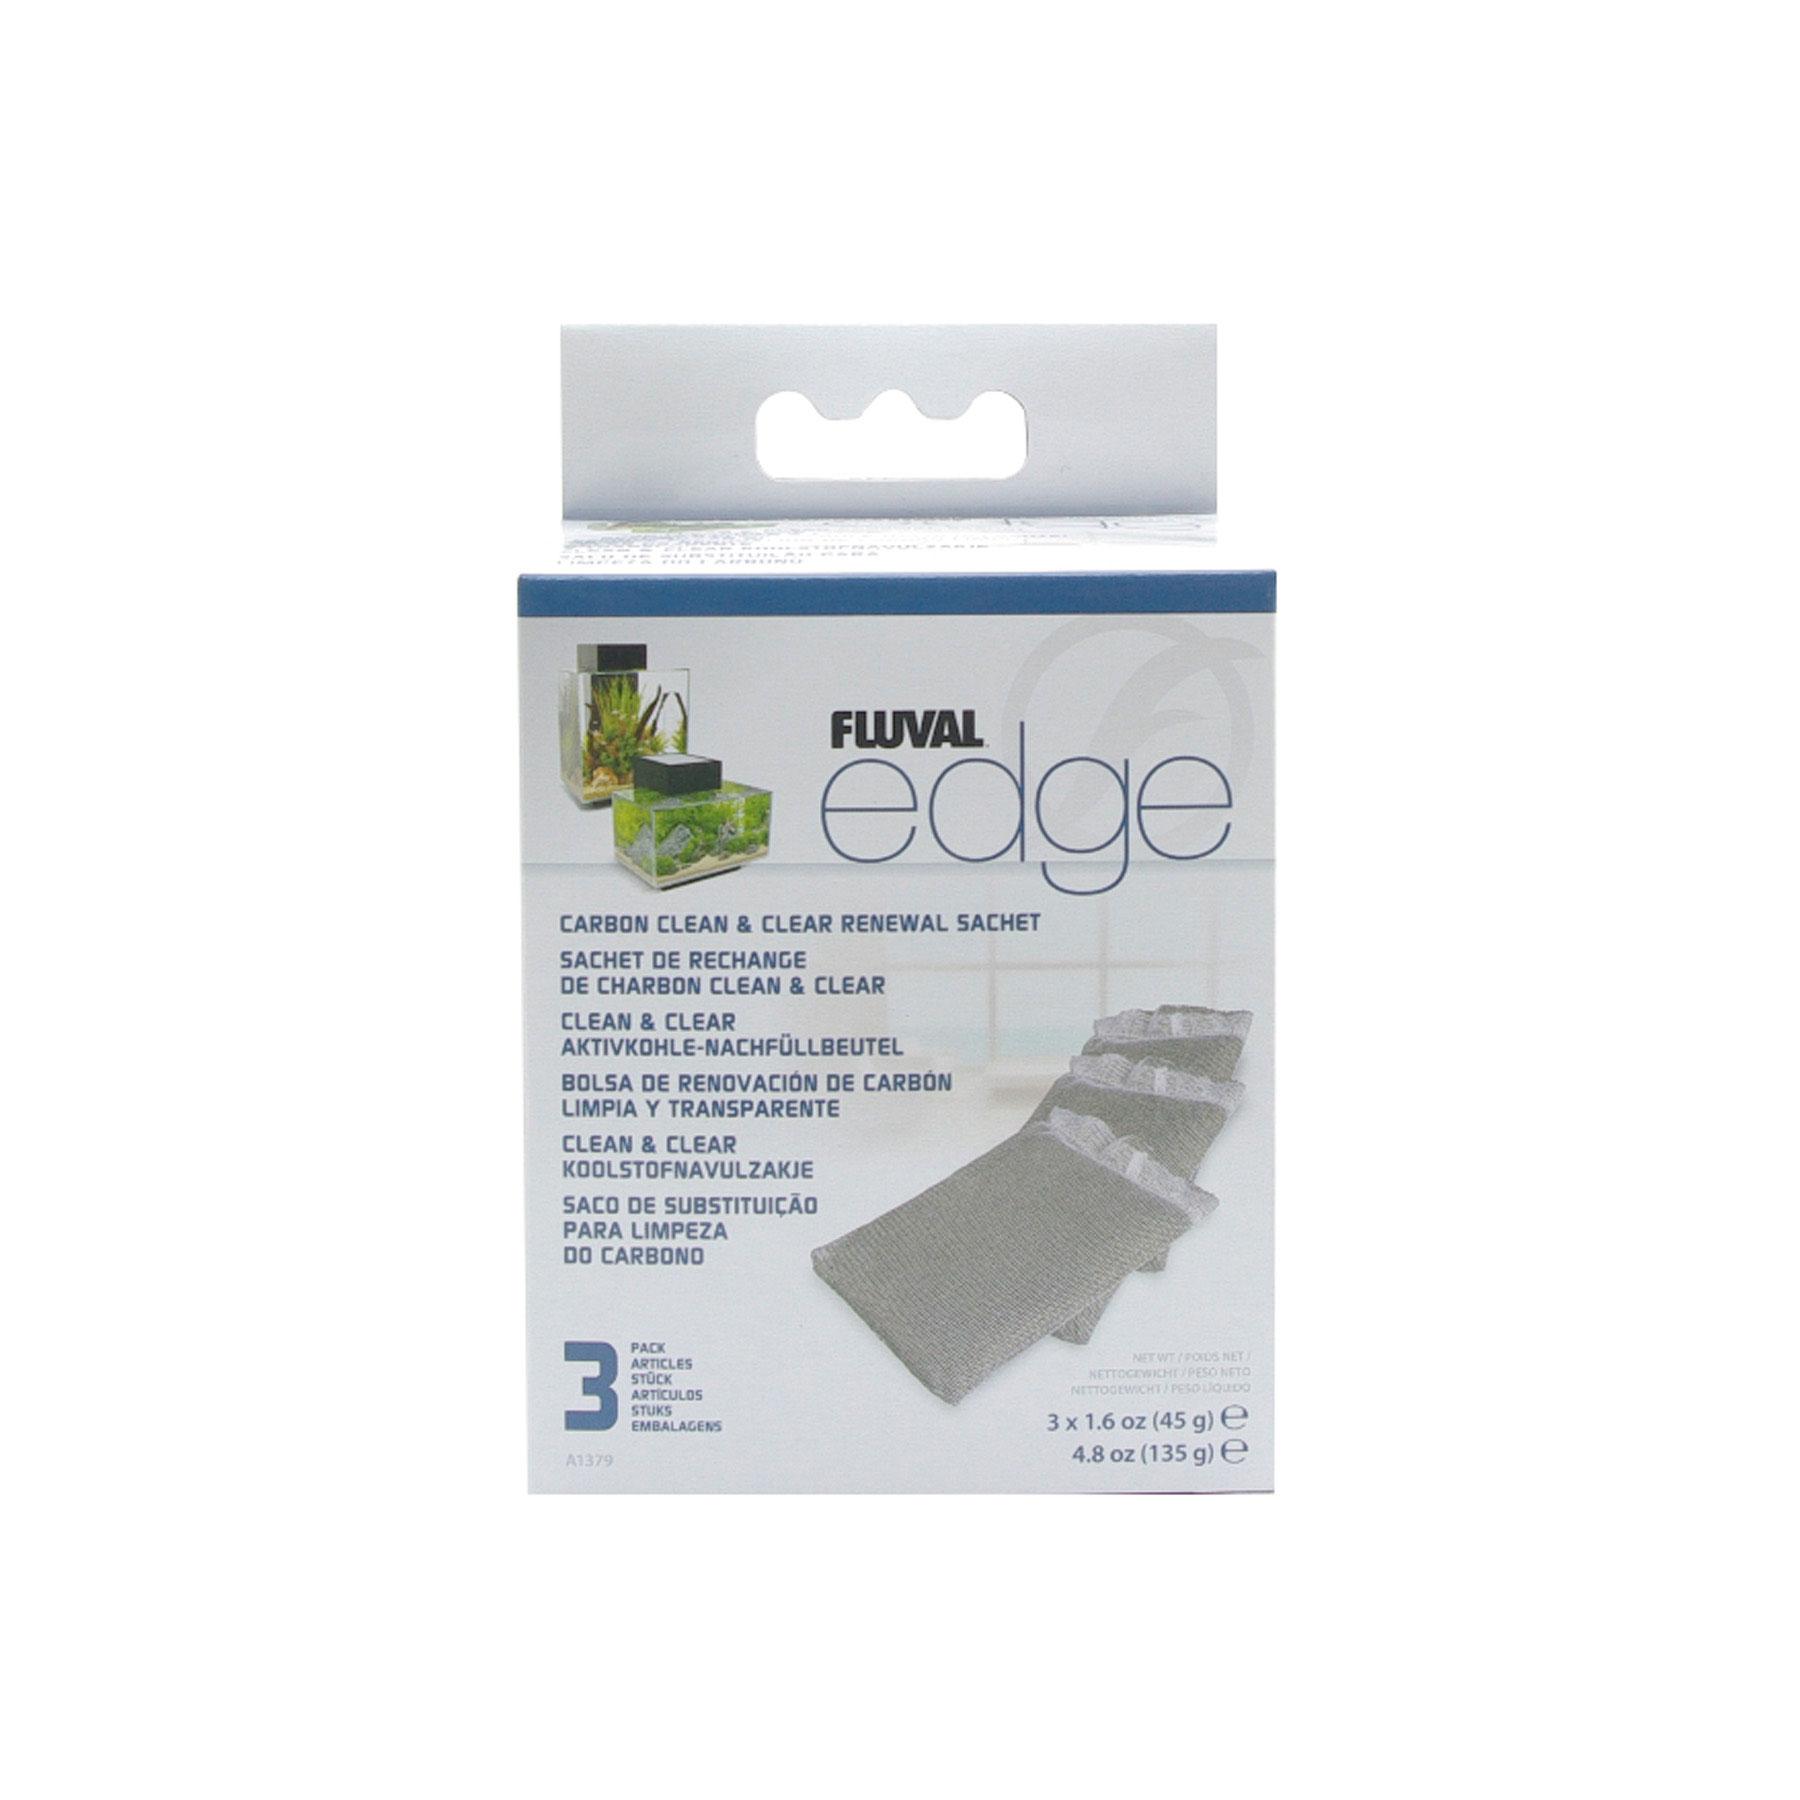 Fluval Edge Carbon Clean & Clear Renewal Sachet 3 Pack